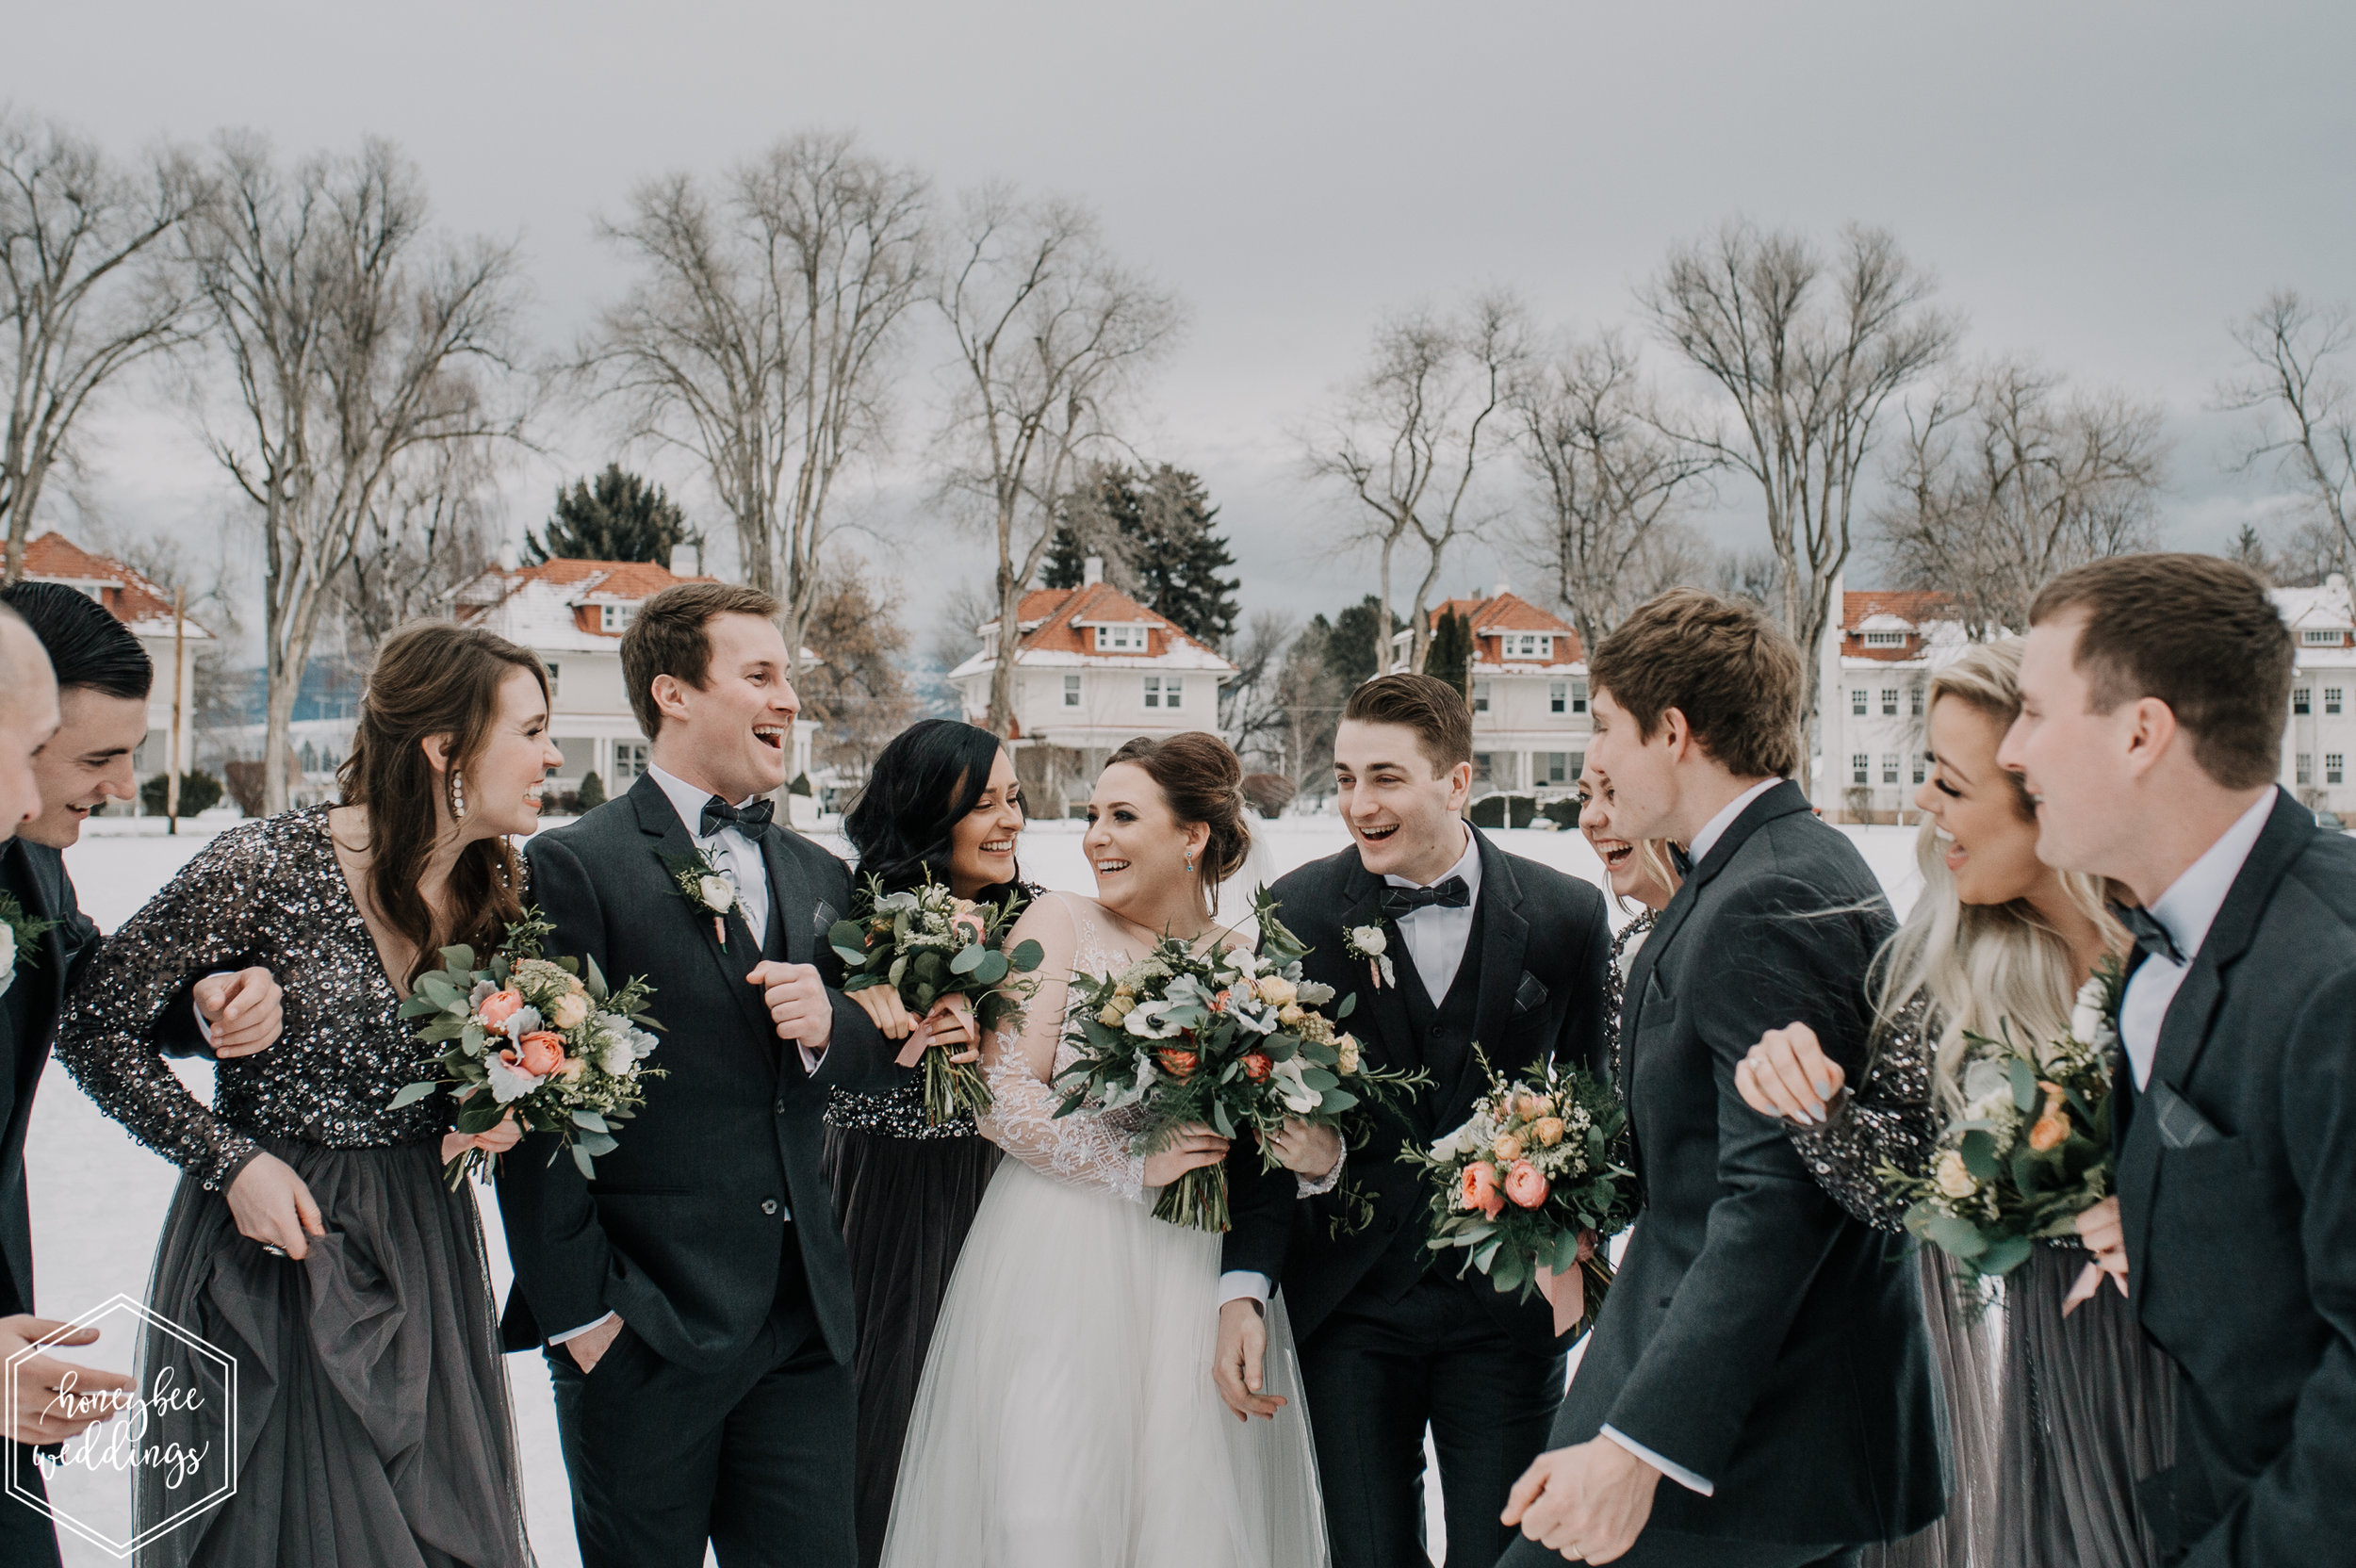 0193Montana Wedding Photographer_Montana winter wedding_Wedding at Fort Missoula_Meri & Carter_January 19, 2018-428.jpg